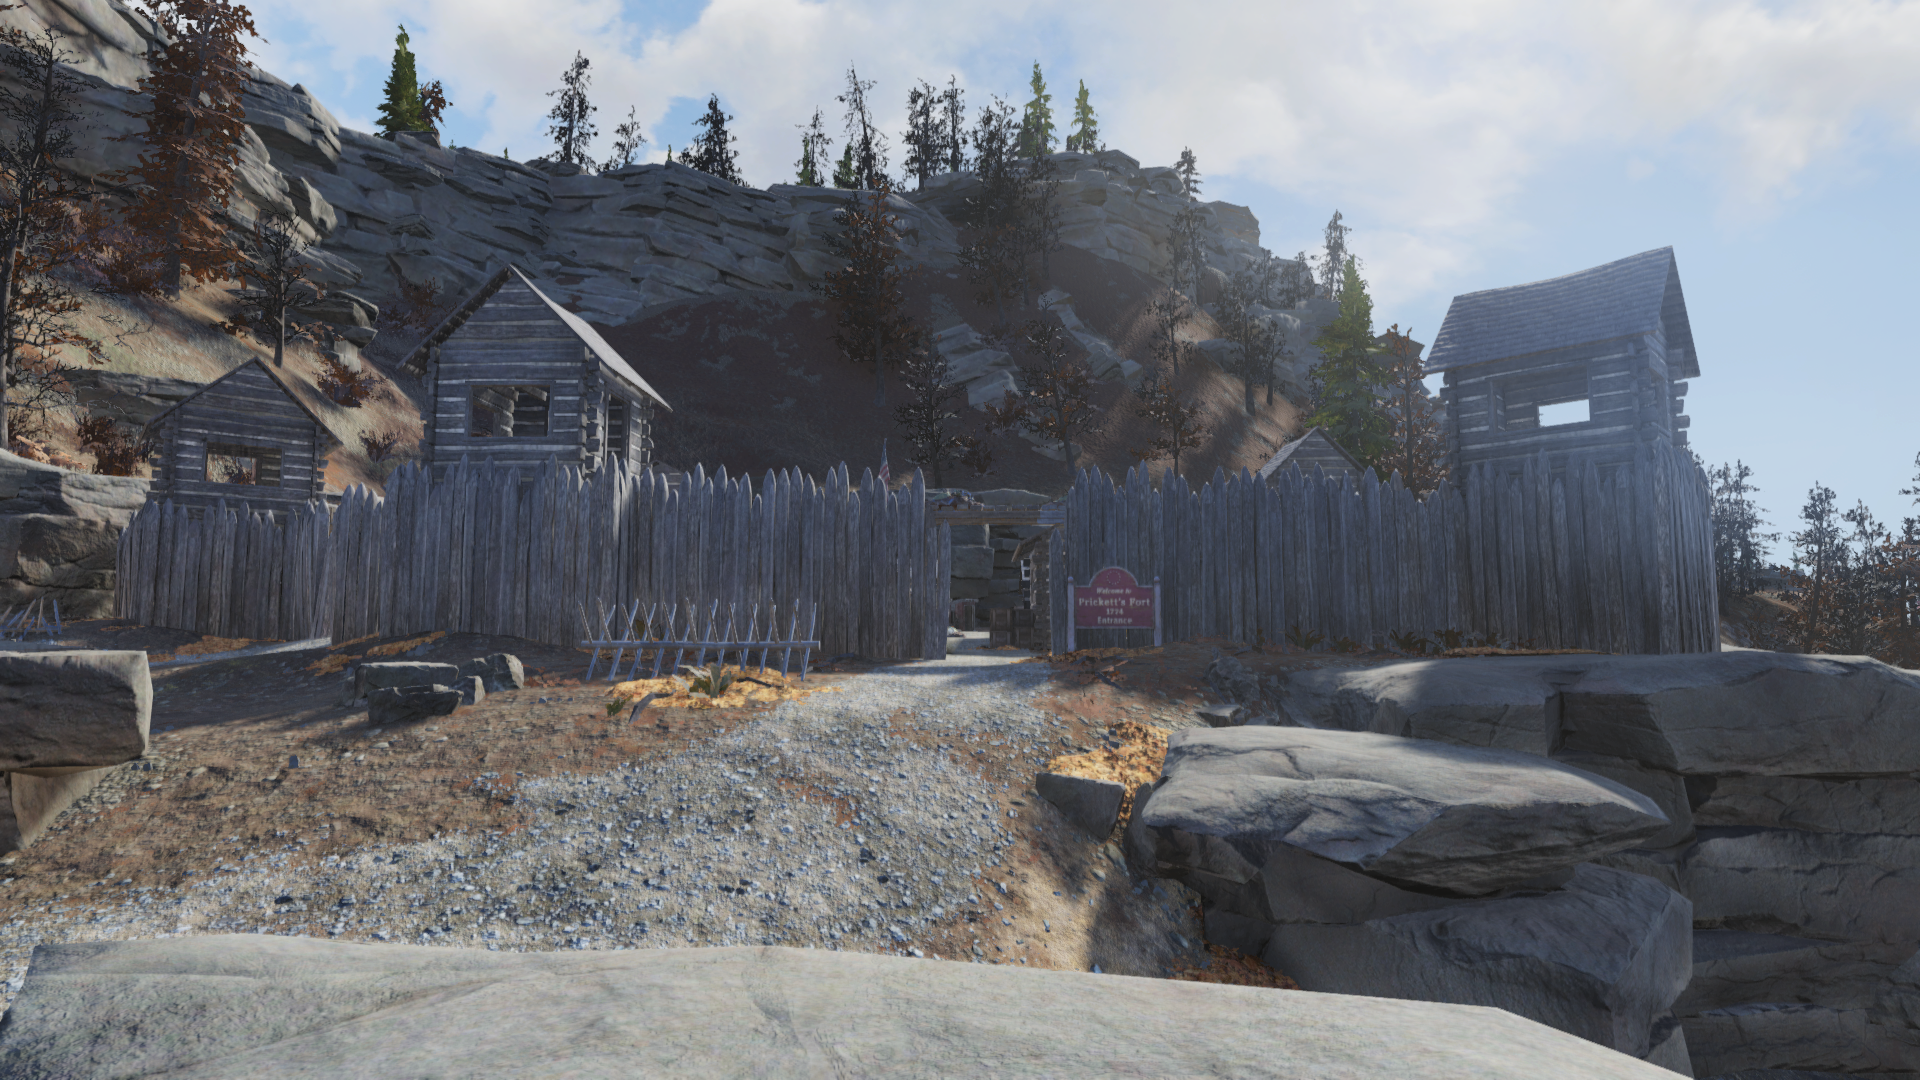 Prickett's Fort